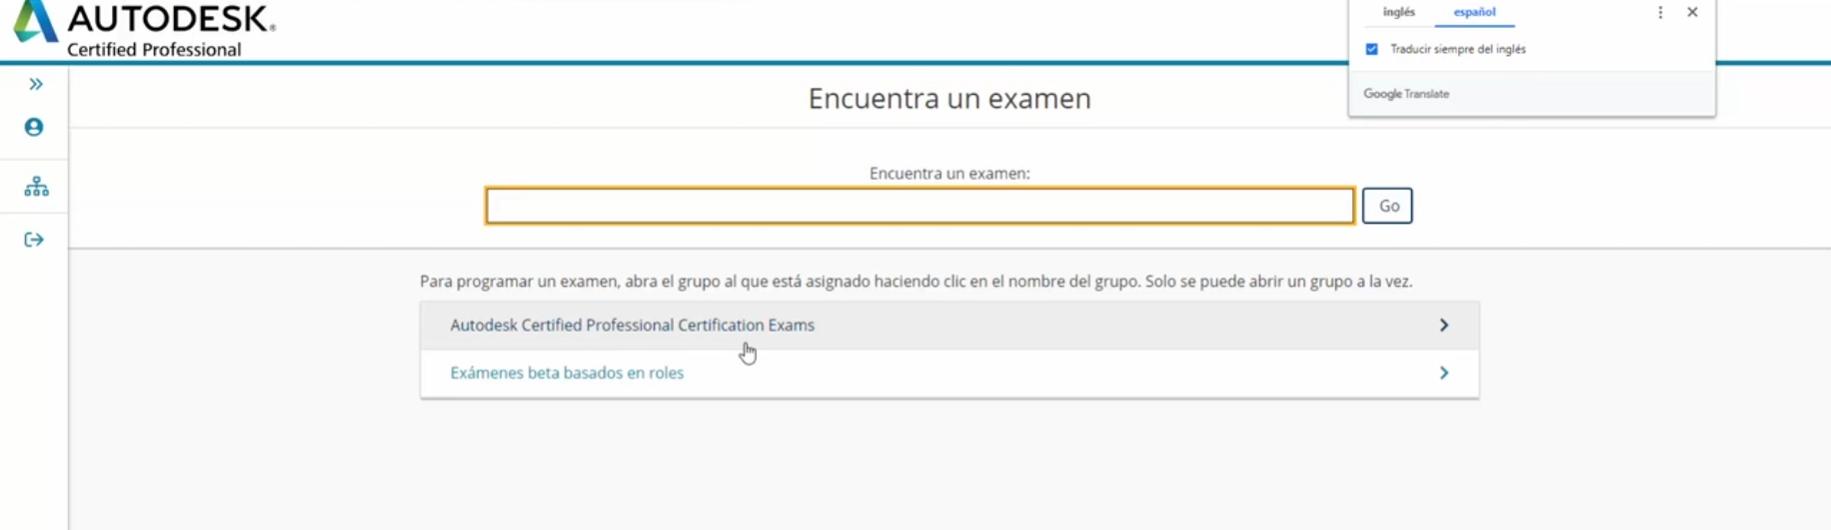 certificacion-autodesk-blog-2